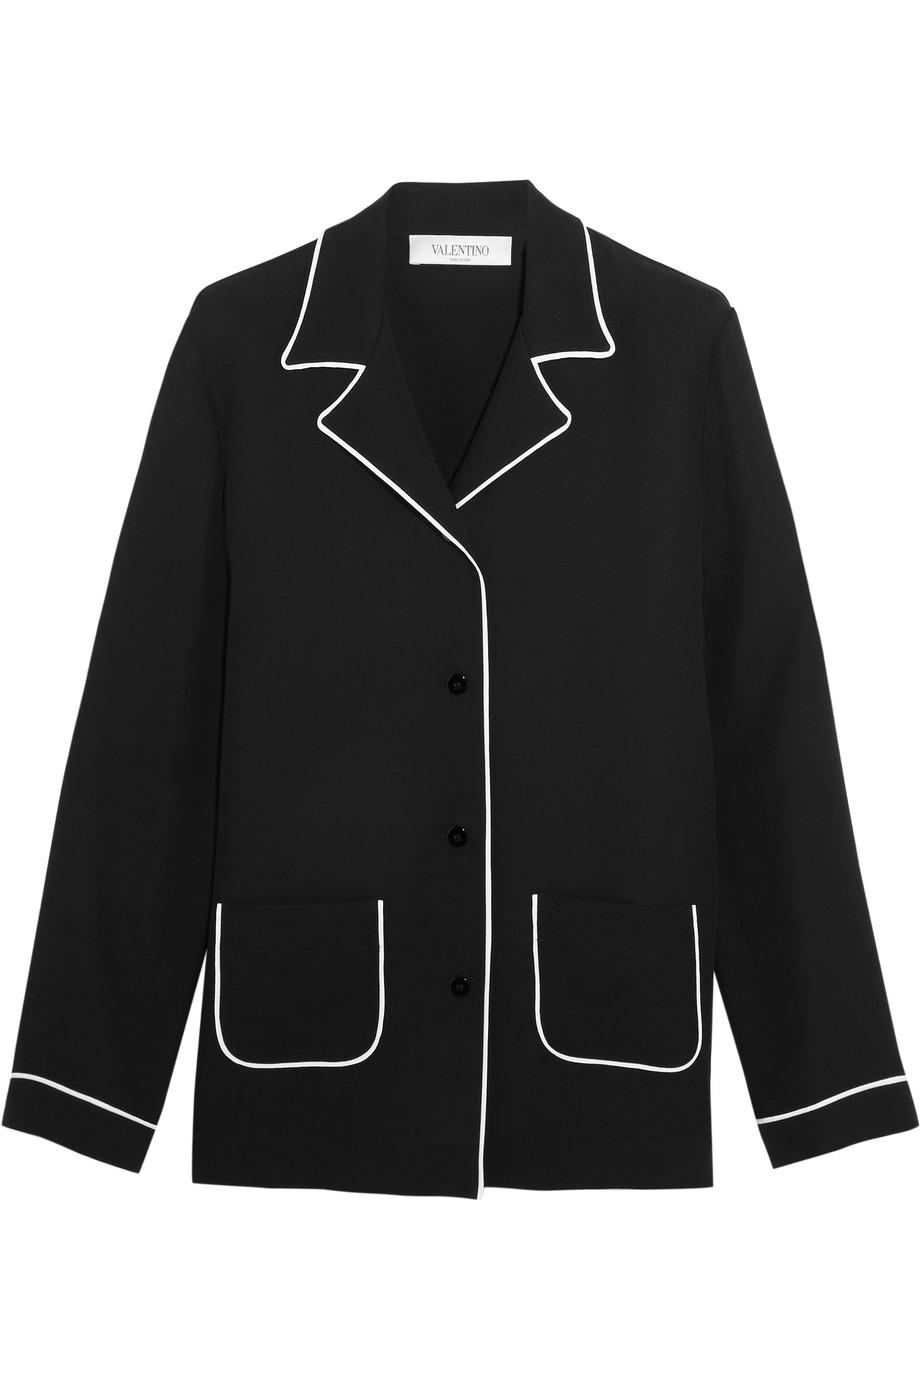 Valentino Silk Crepe De Chine Shirt, Black, Women's